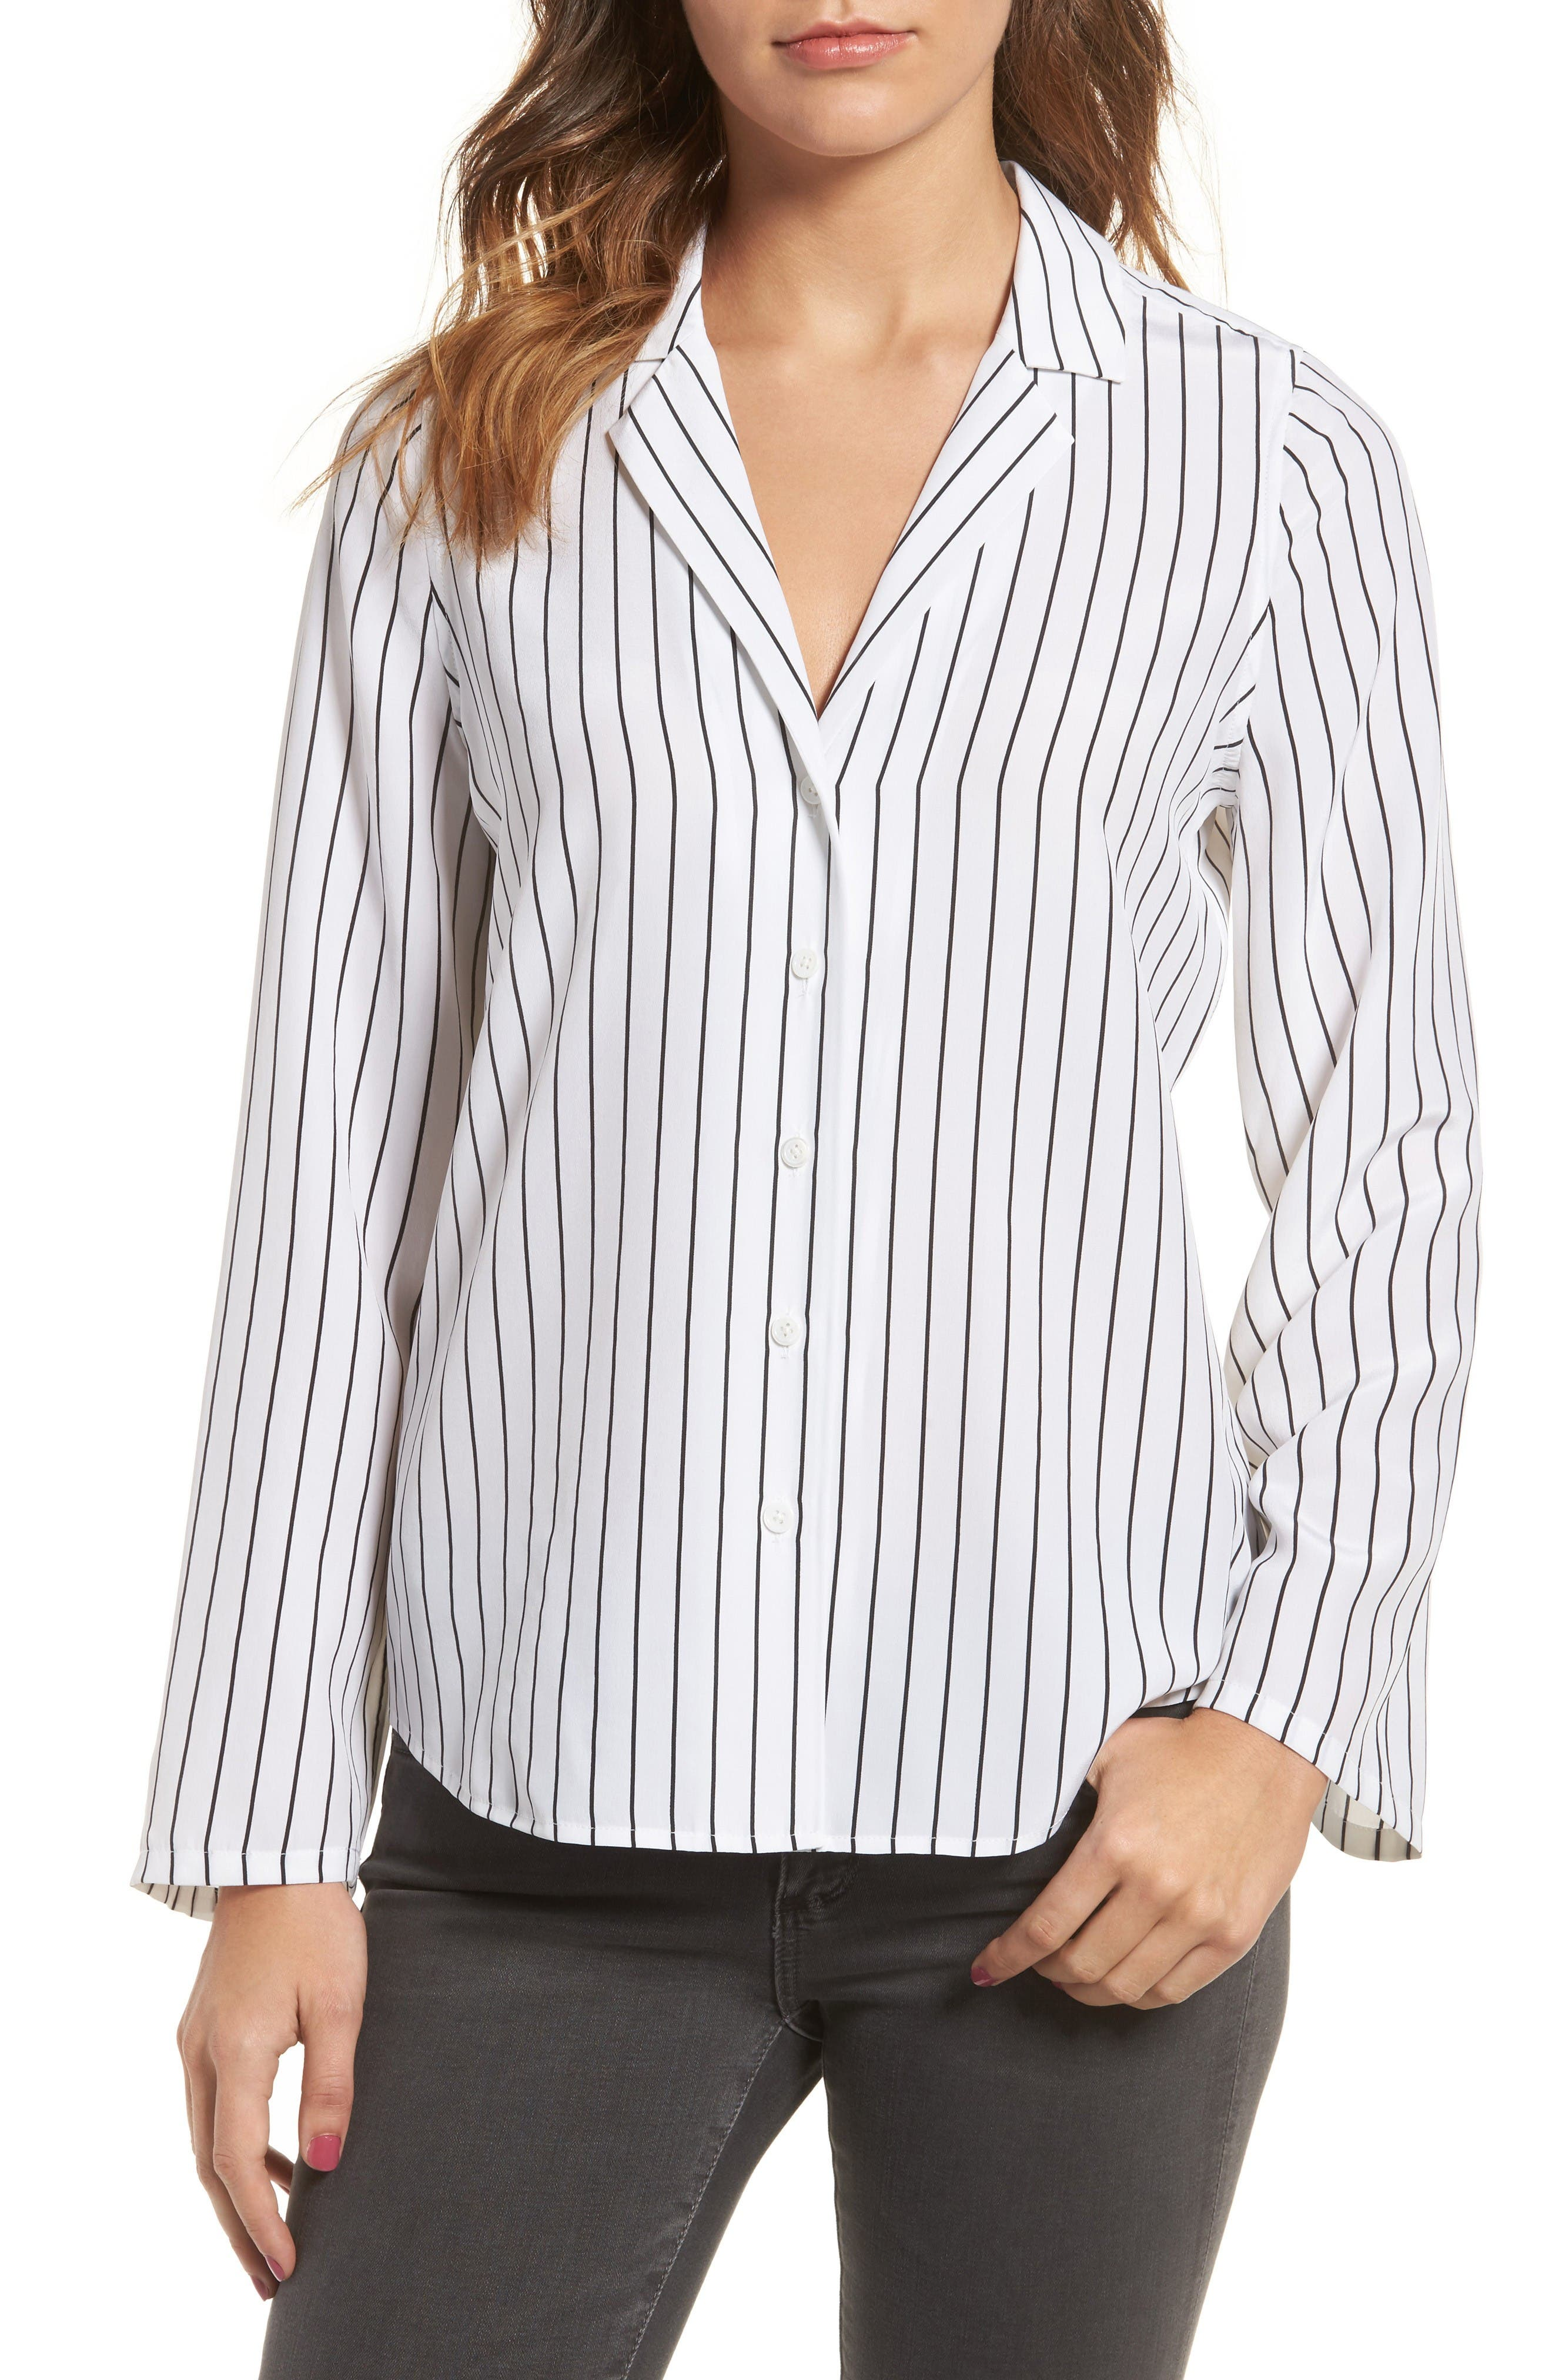 Avery Silk Shirt,                         Main,                         color, True White / True Black Stripe